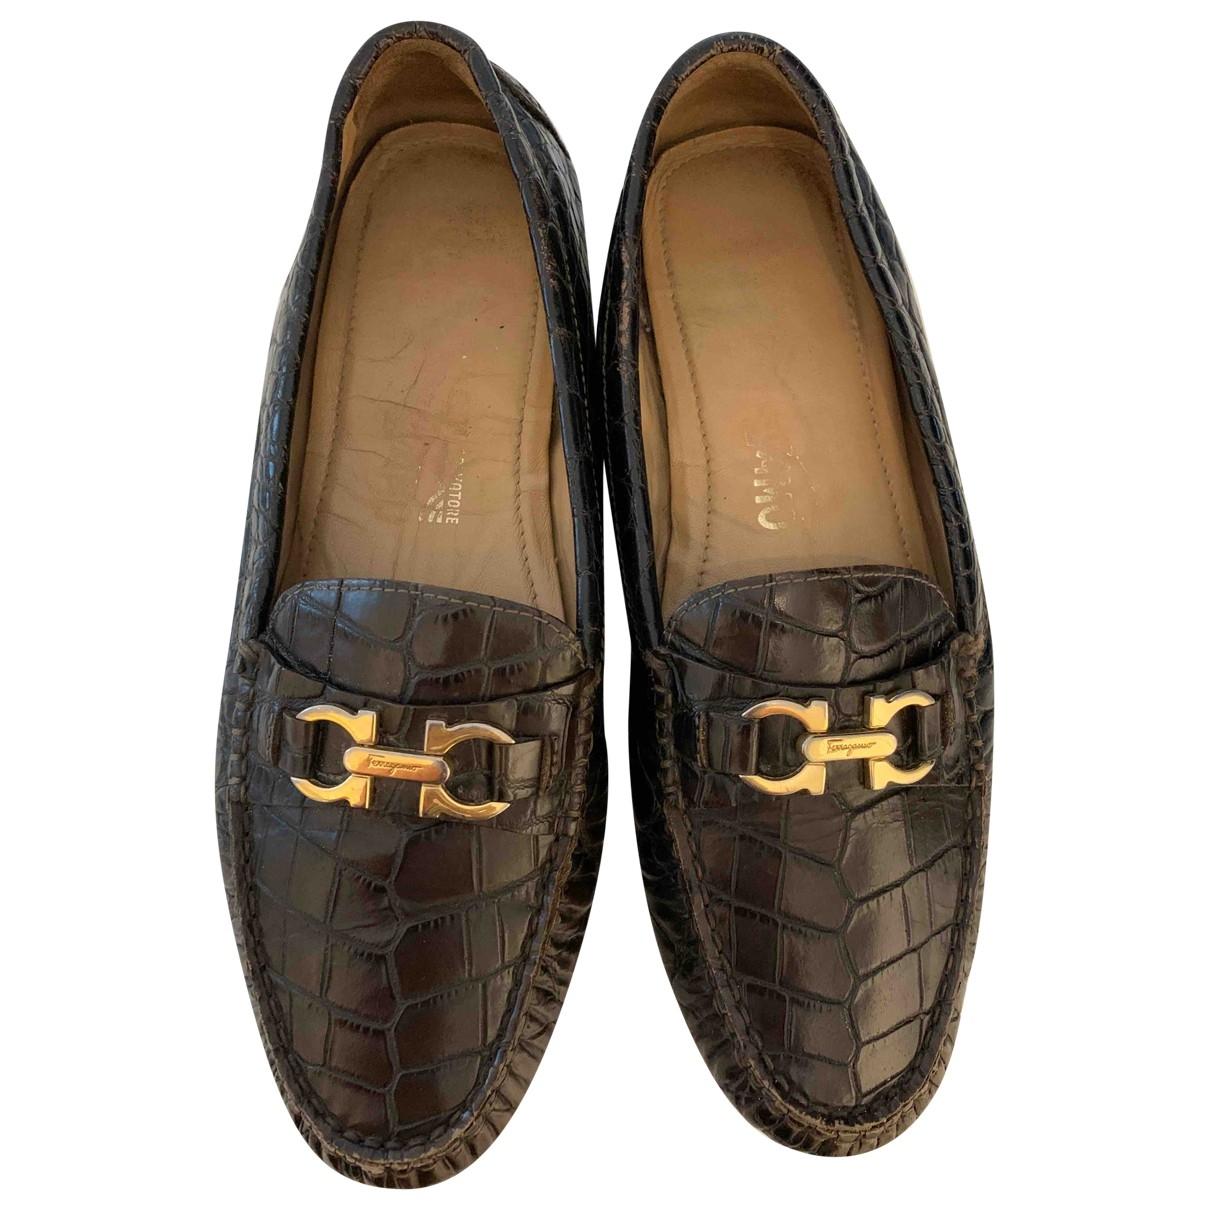 Salvatore Ferragamo \N Brown Crocodile Flats for Women 7.5 US